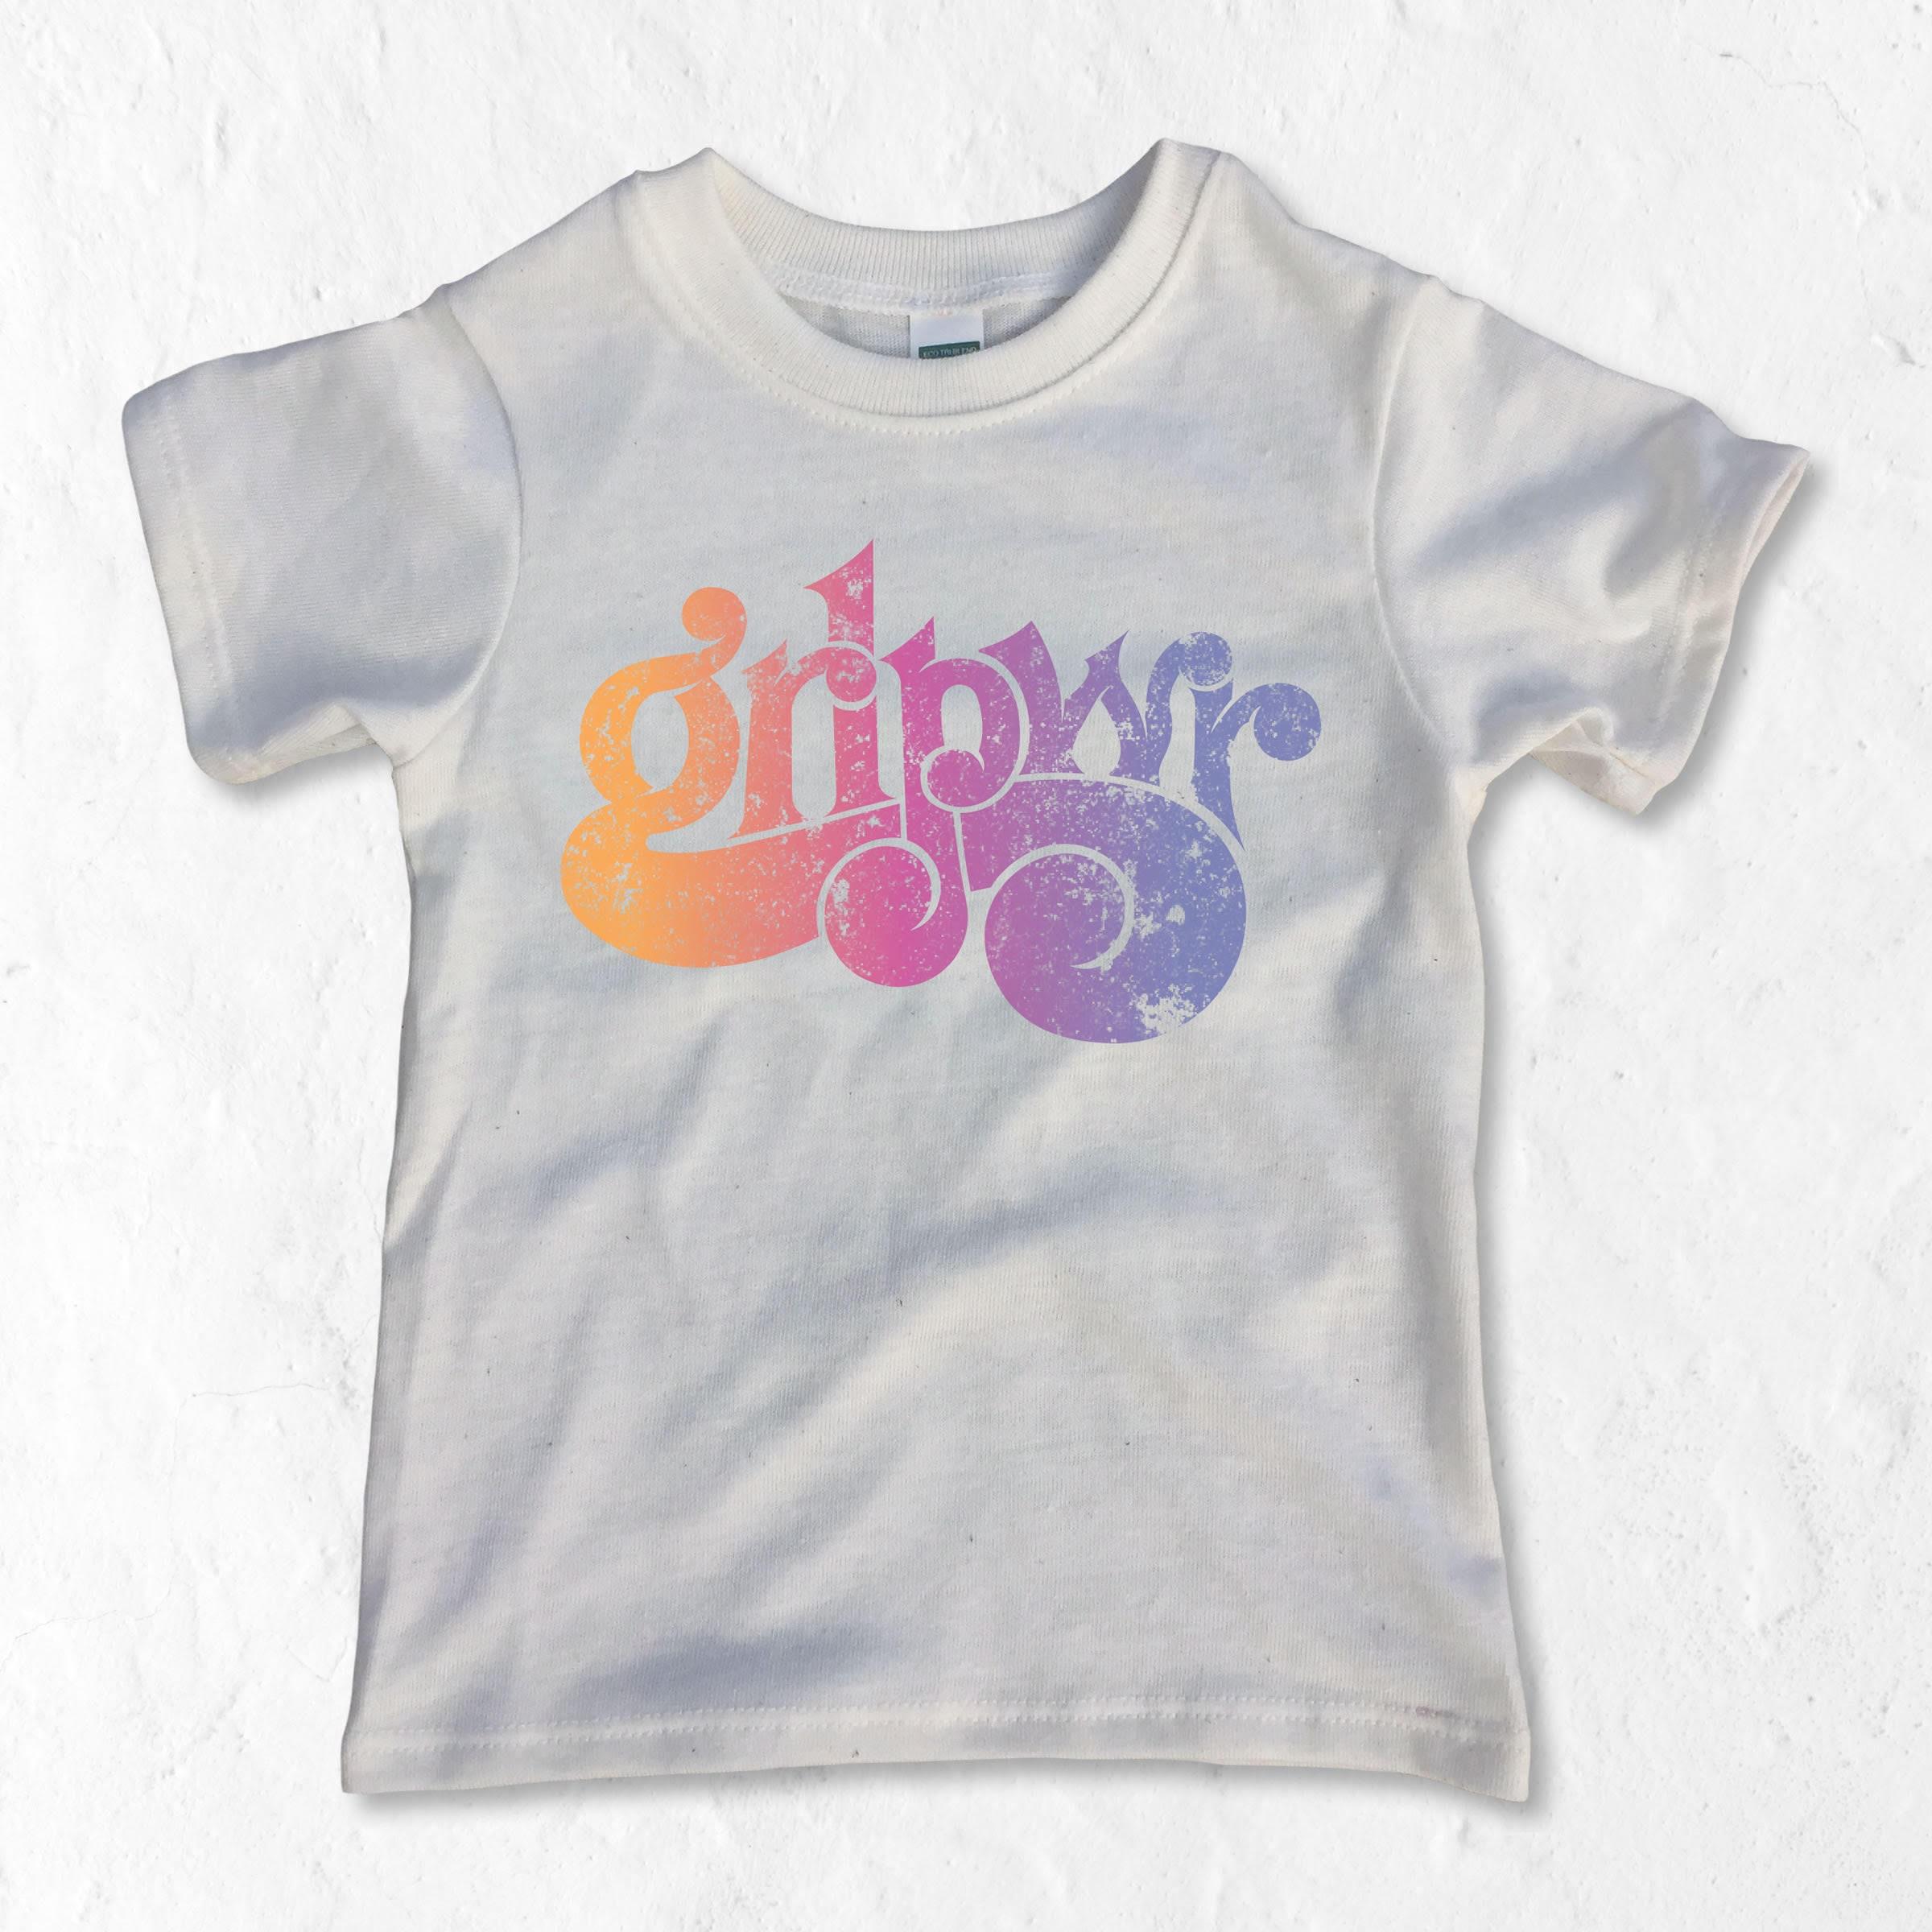 53f11a90 Girl Power shirt / grlpwr t-shirt / Toddler and Youth Shirt / Toddler Girl  Clothes / Toddler Clothes / grl pwr tee / vintage / retro / kids